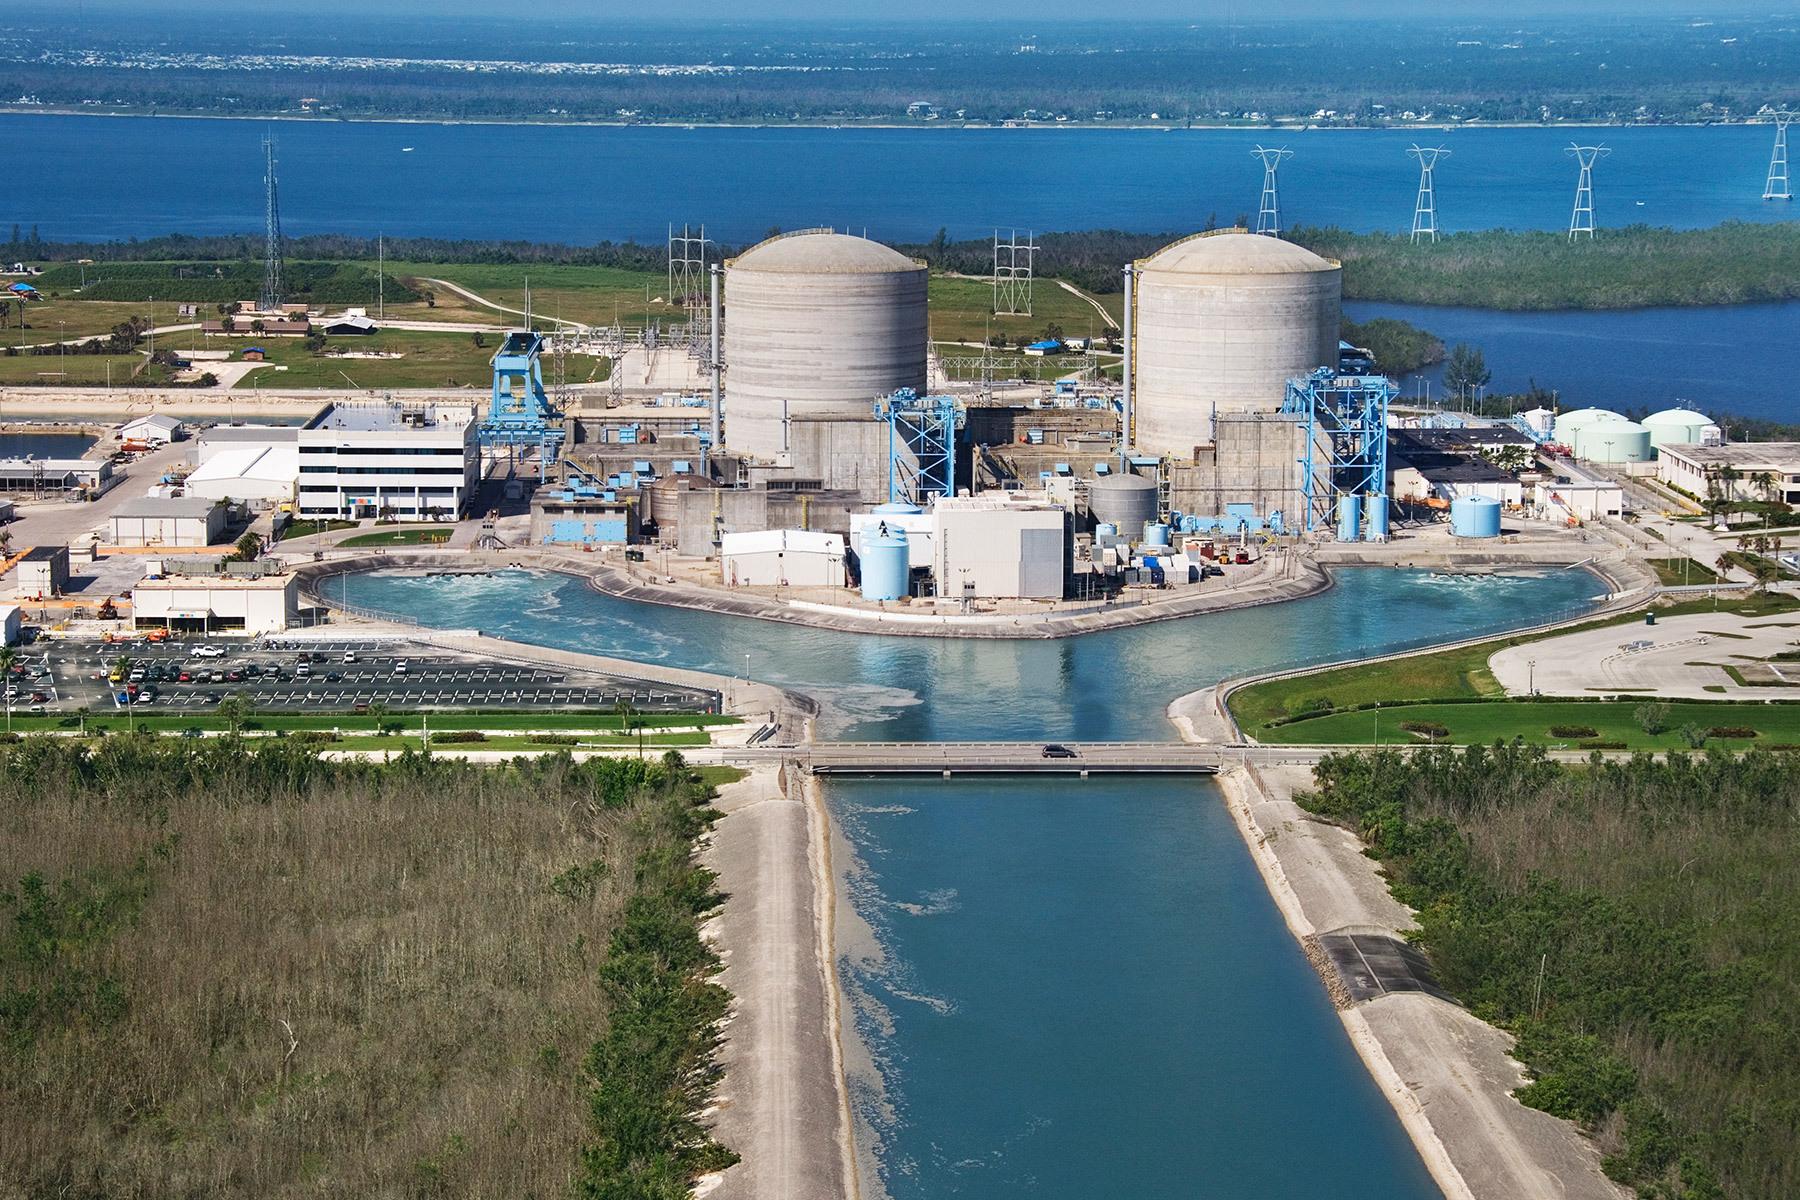 Numip_jedrska_energetika_online.jpg